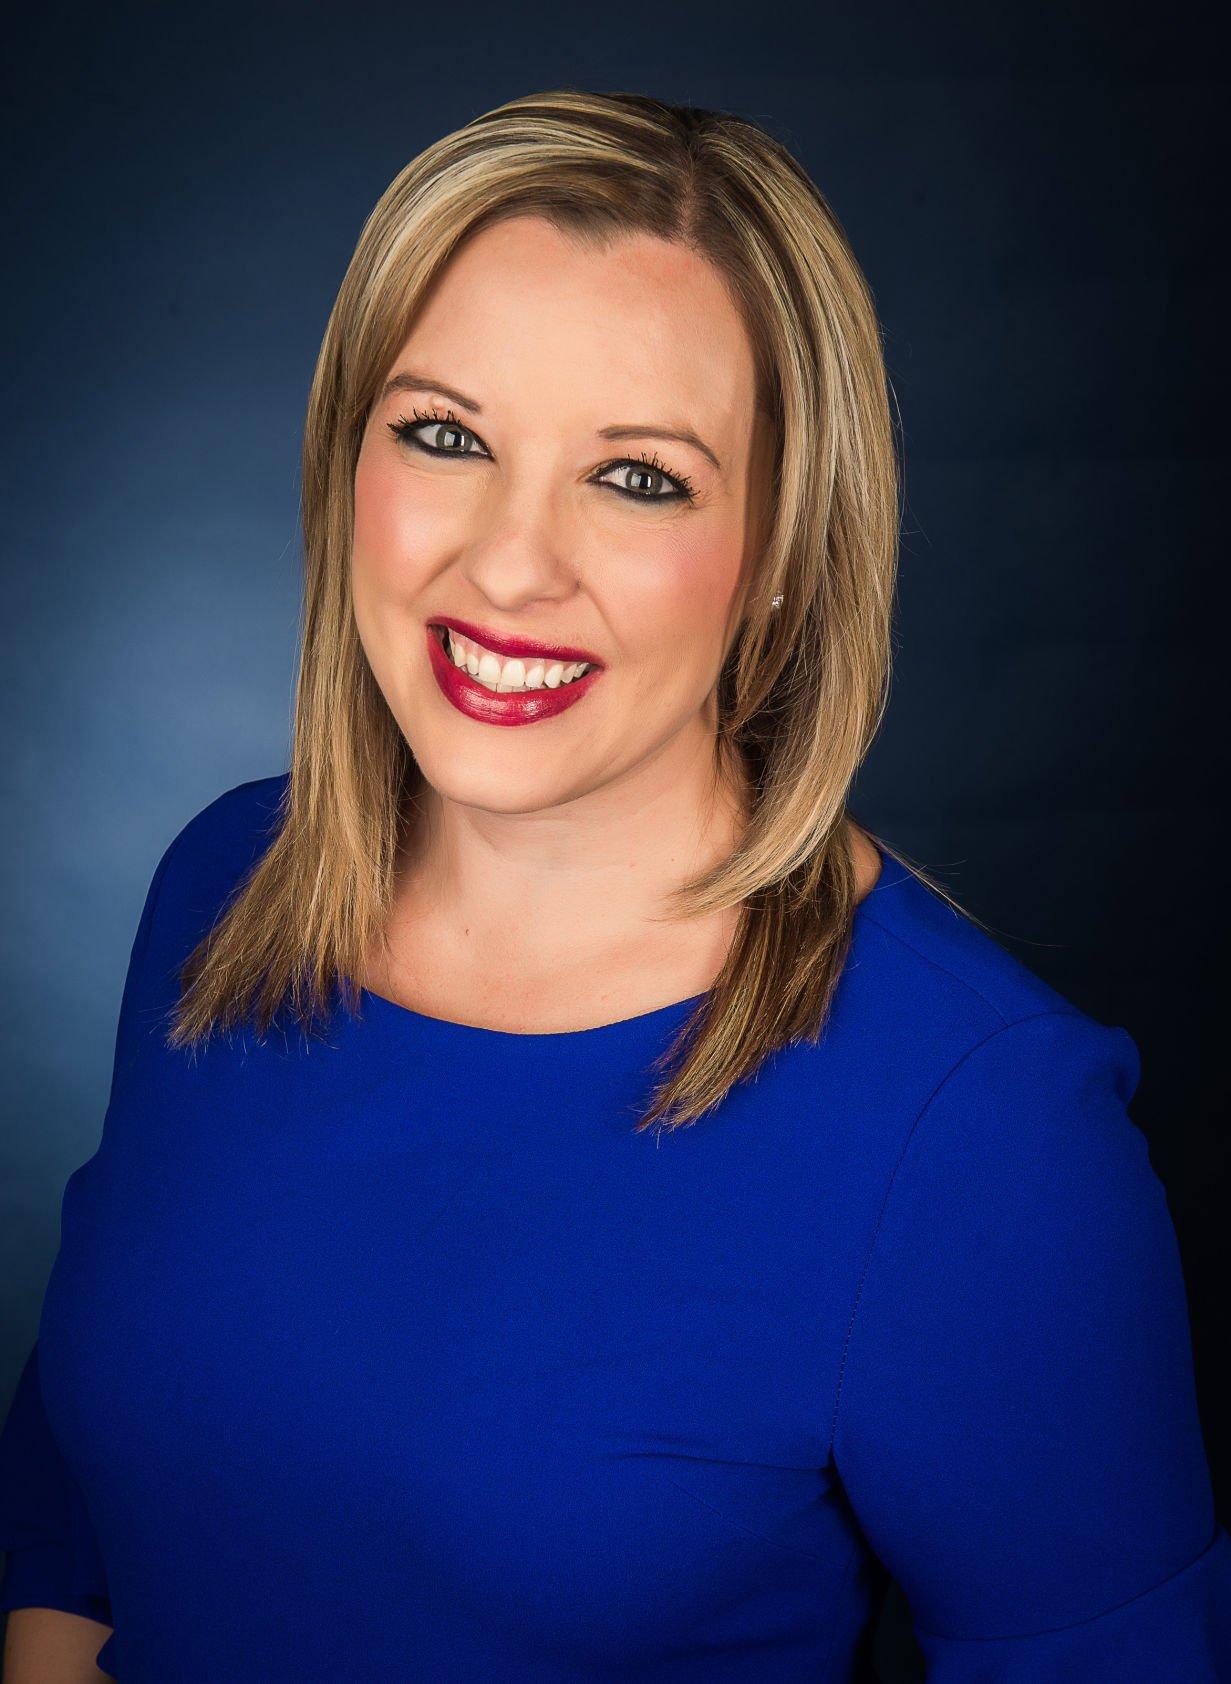 Katie Pelton